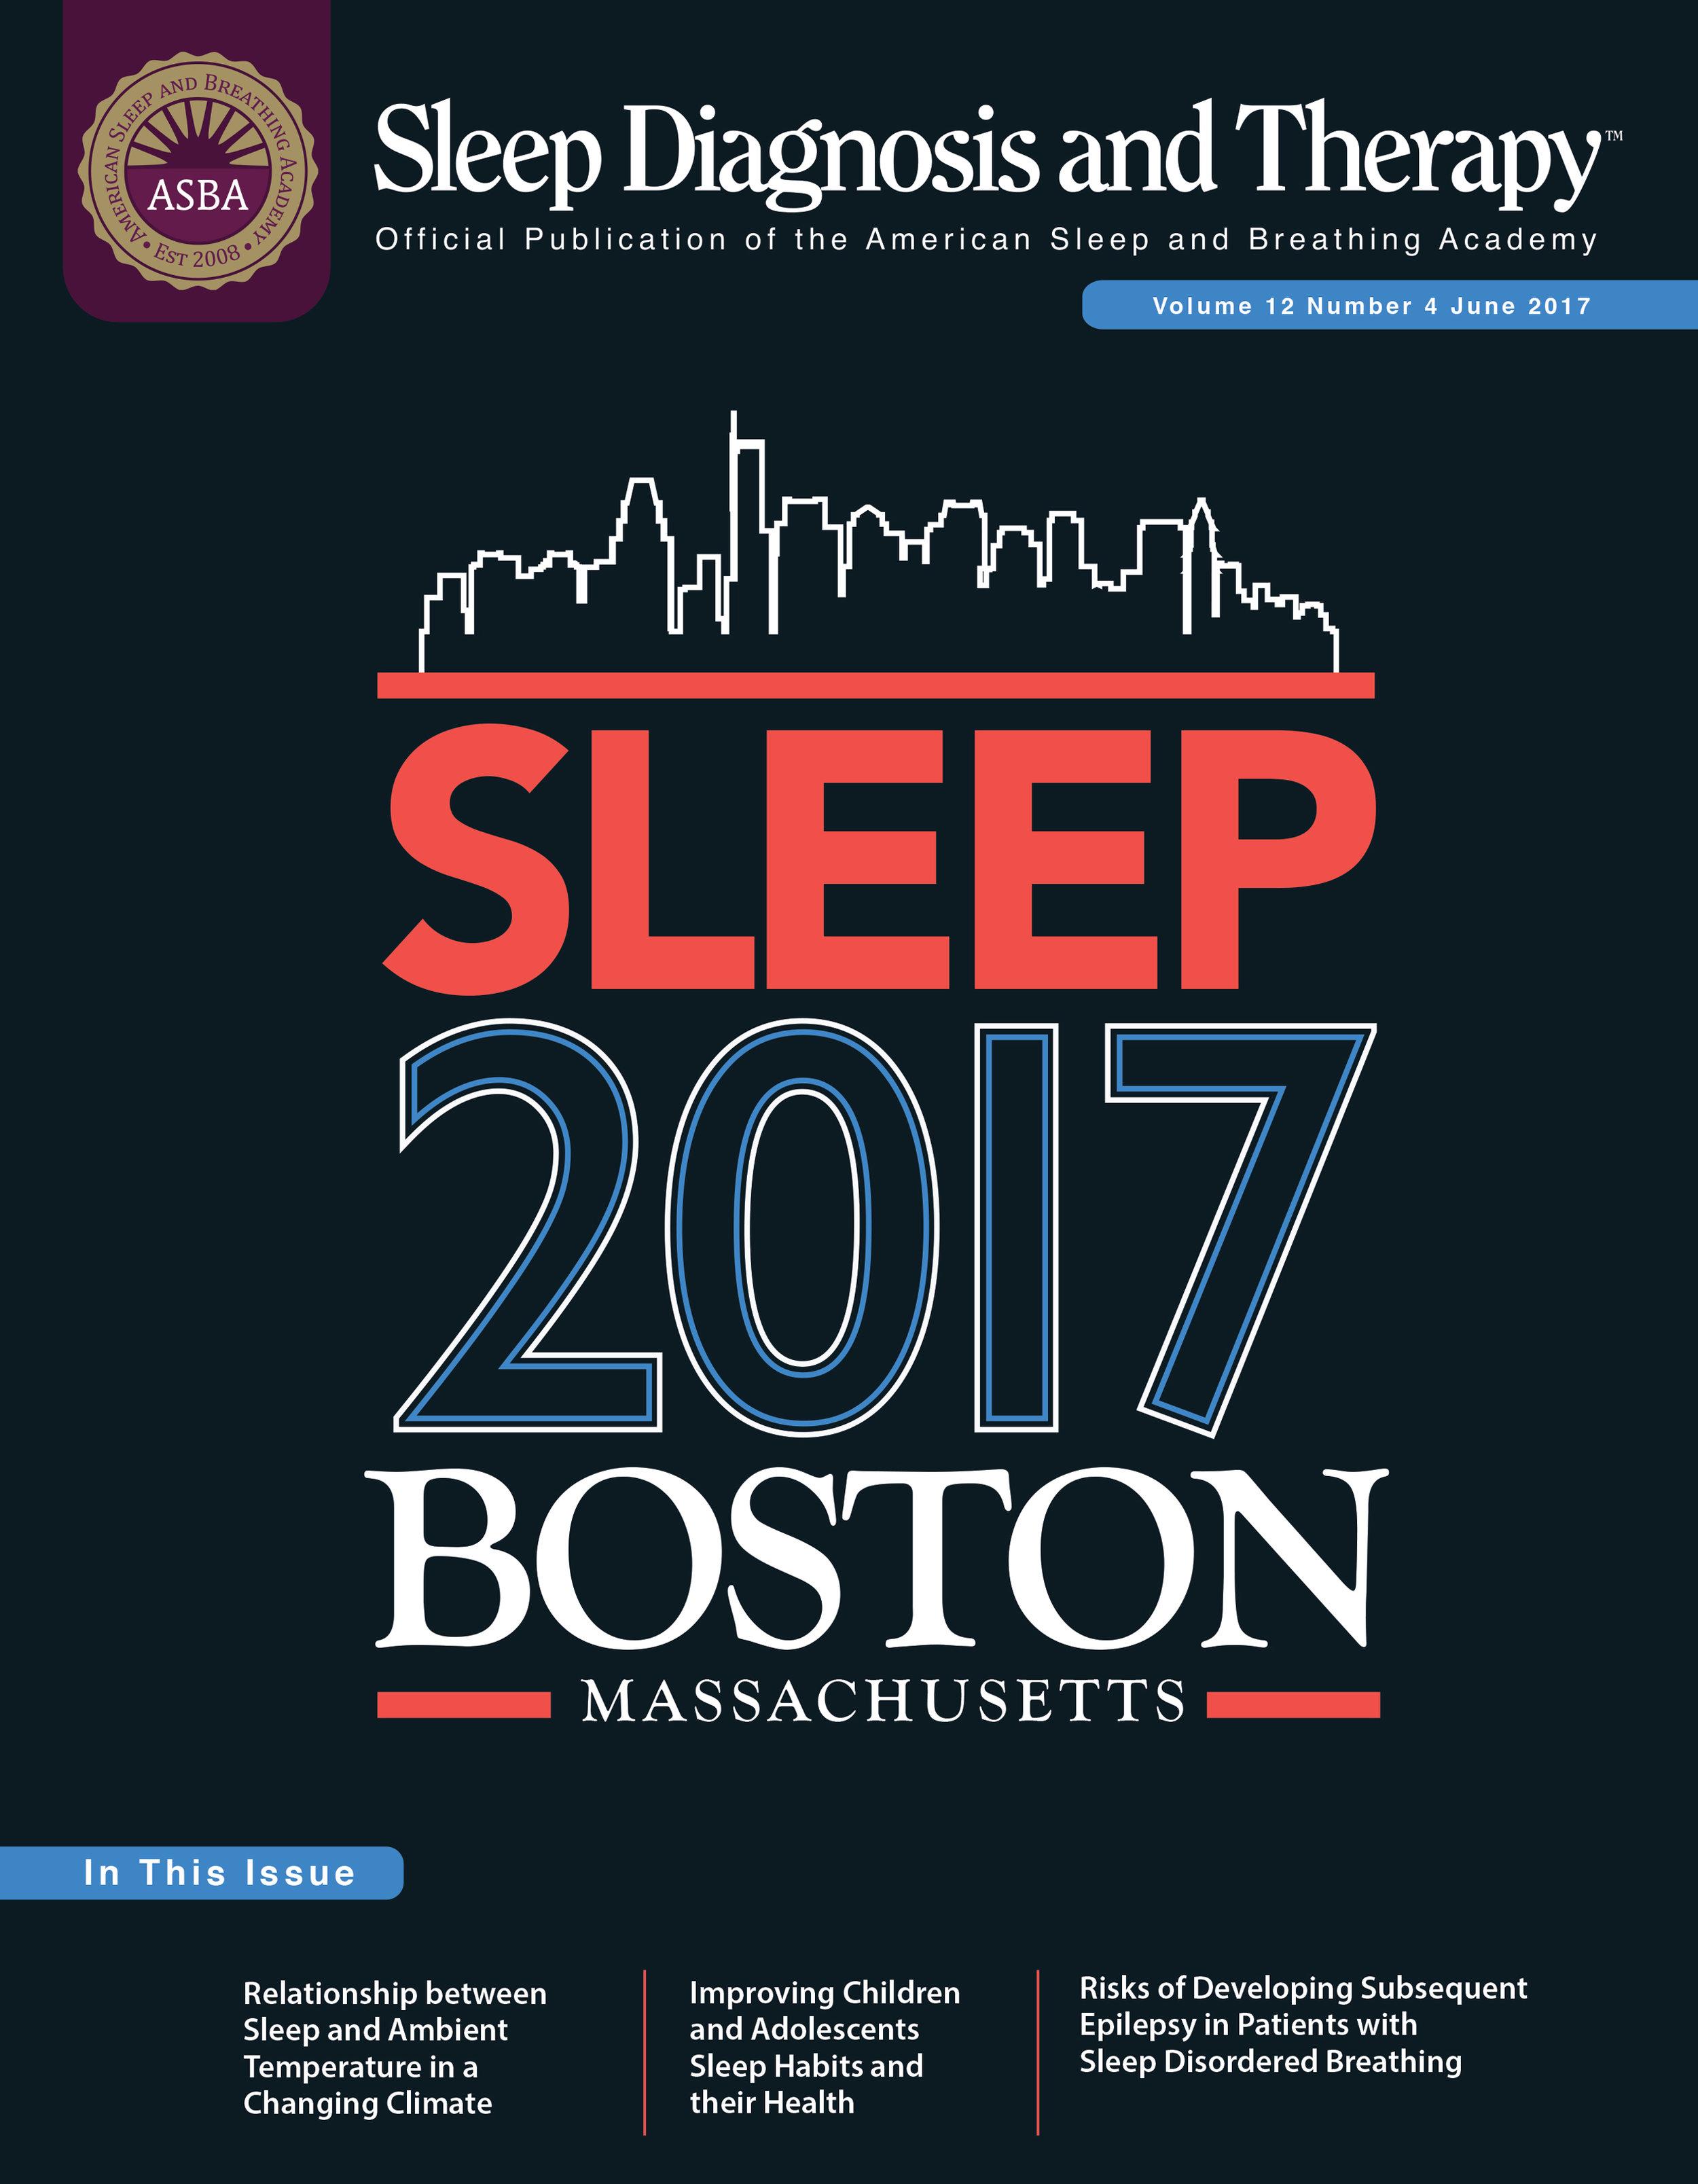 SleepDT-2017-Vol-12-No-4-June-2017.jpg